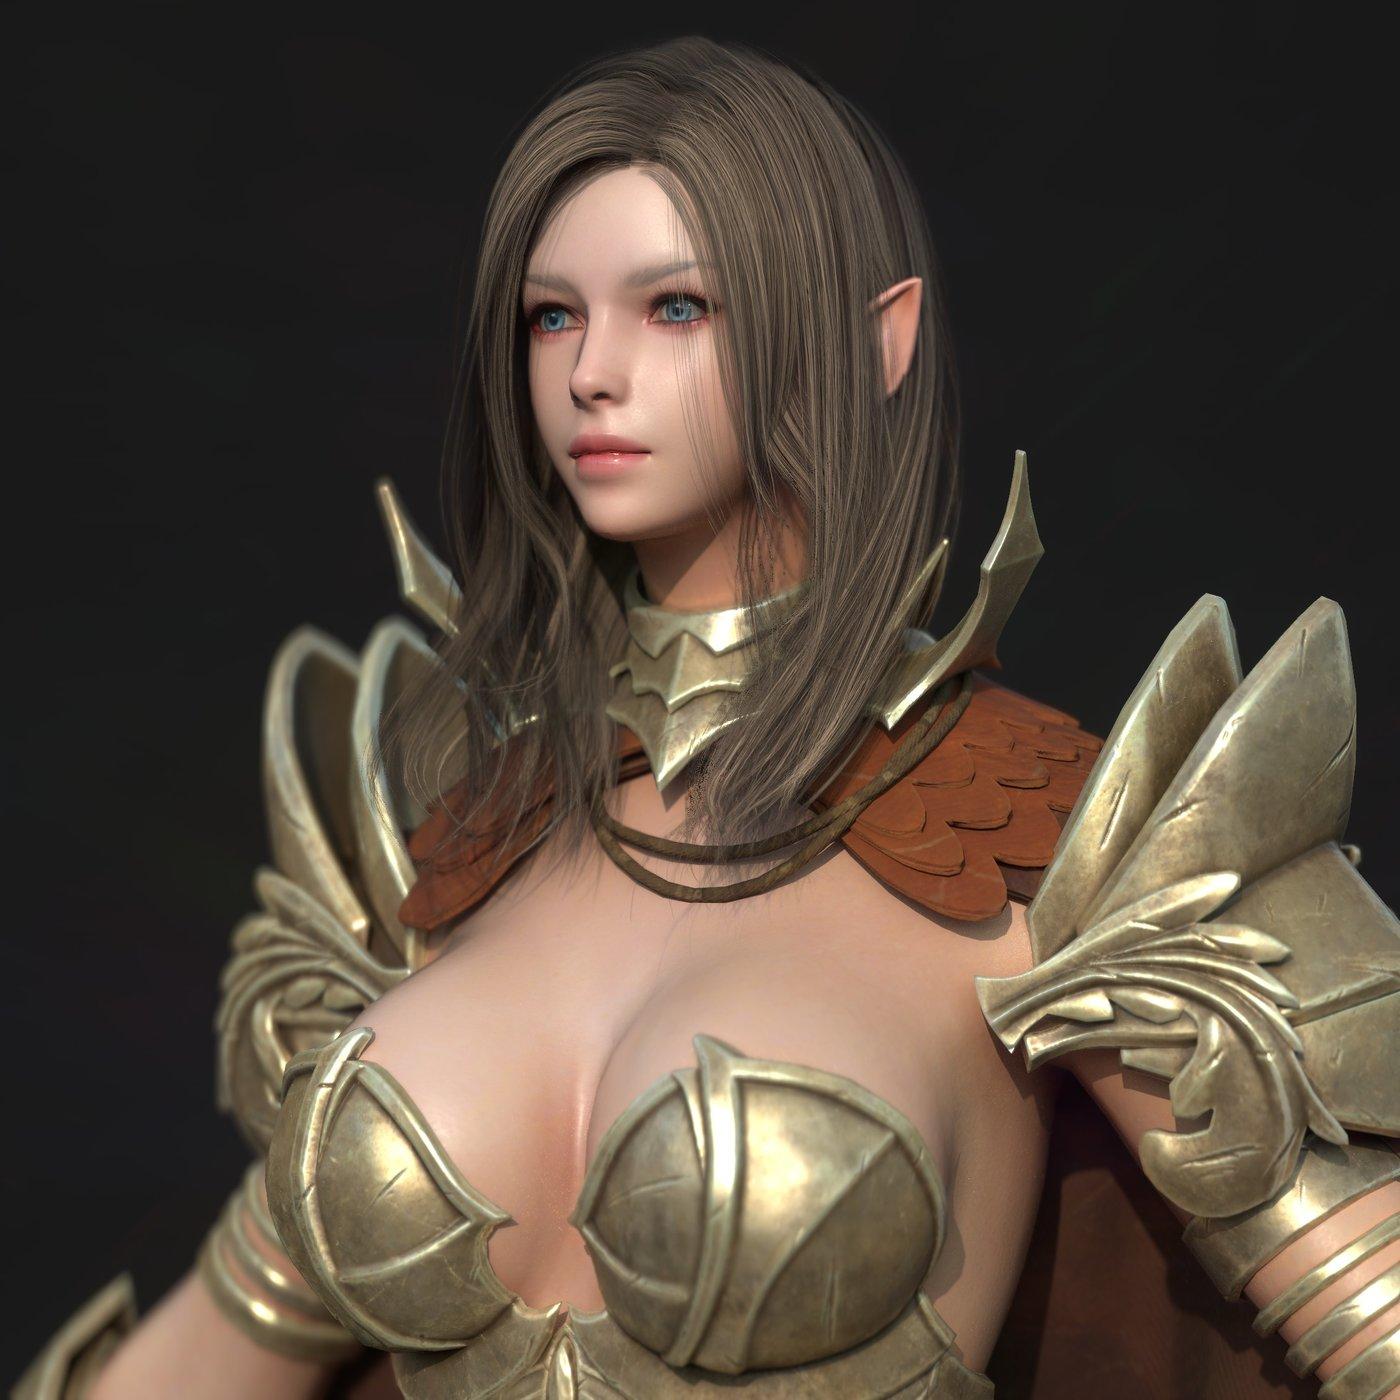 Valkyrie Warrior Girl Rigging Unreal